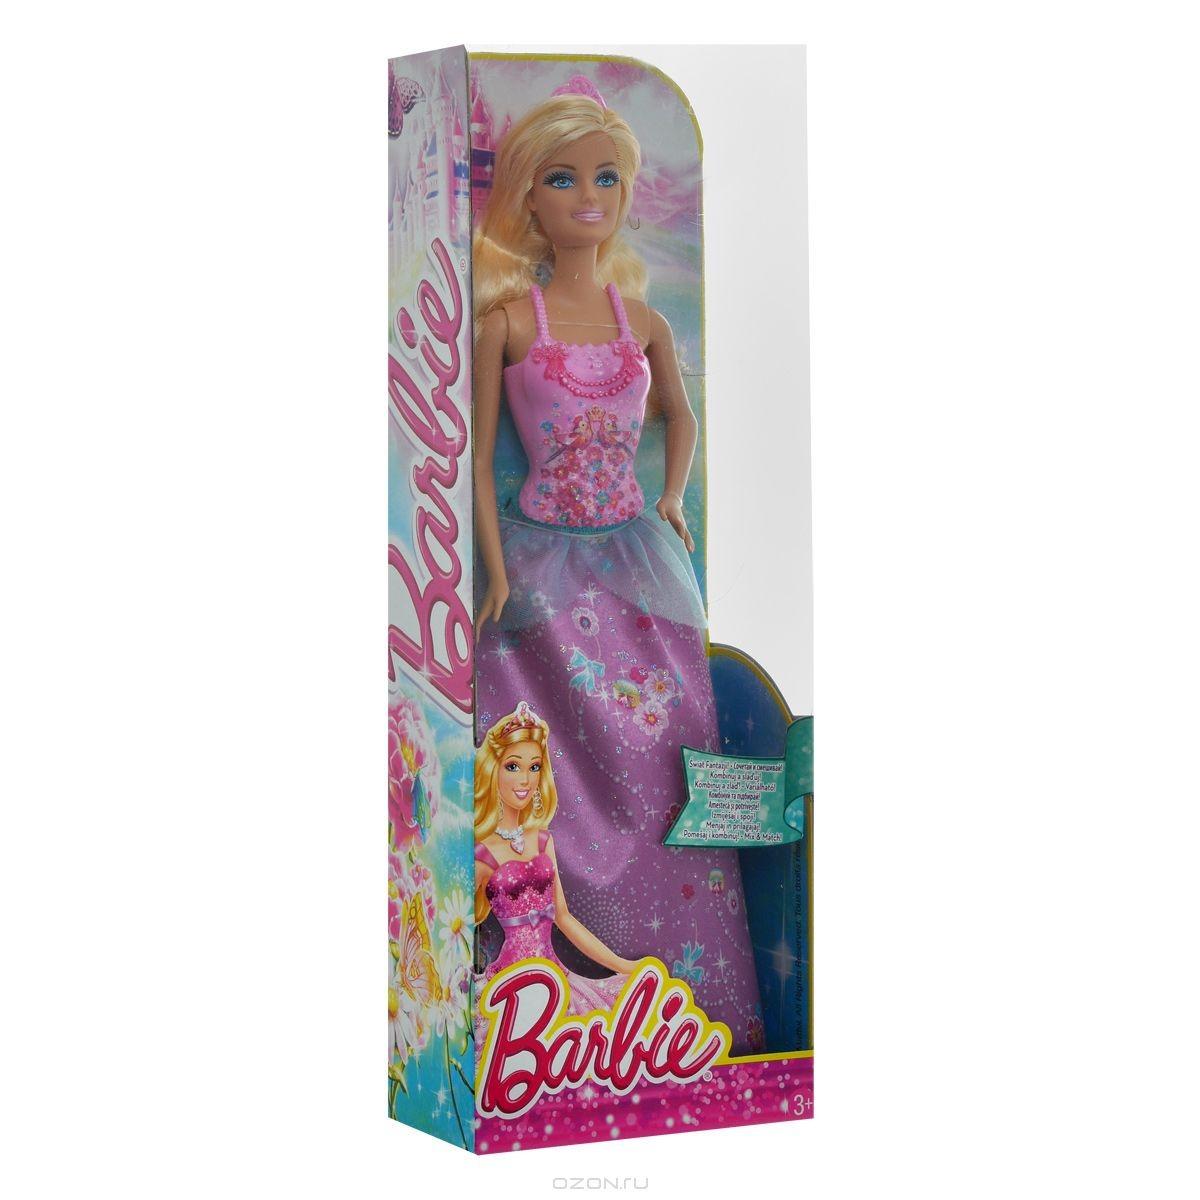 Кукла Барби. Принцесса мира моды: Блондинка